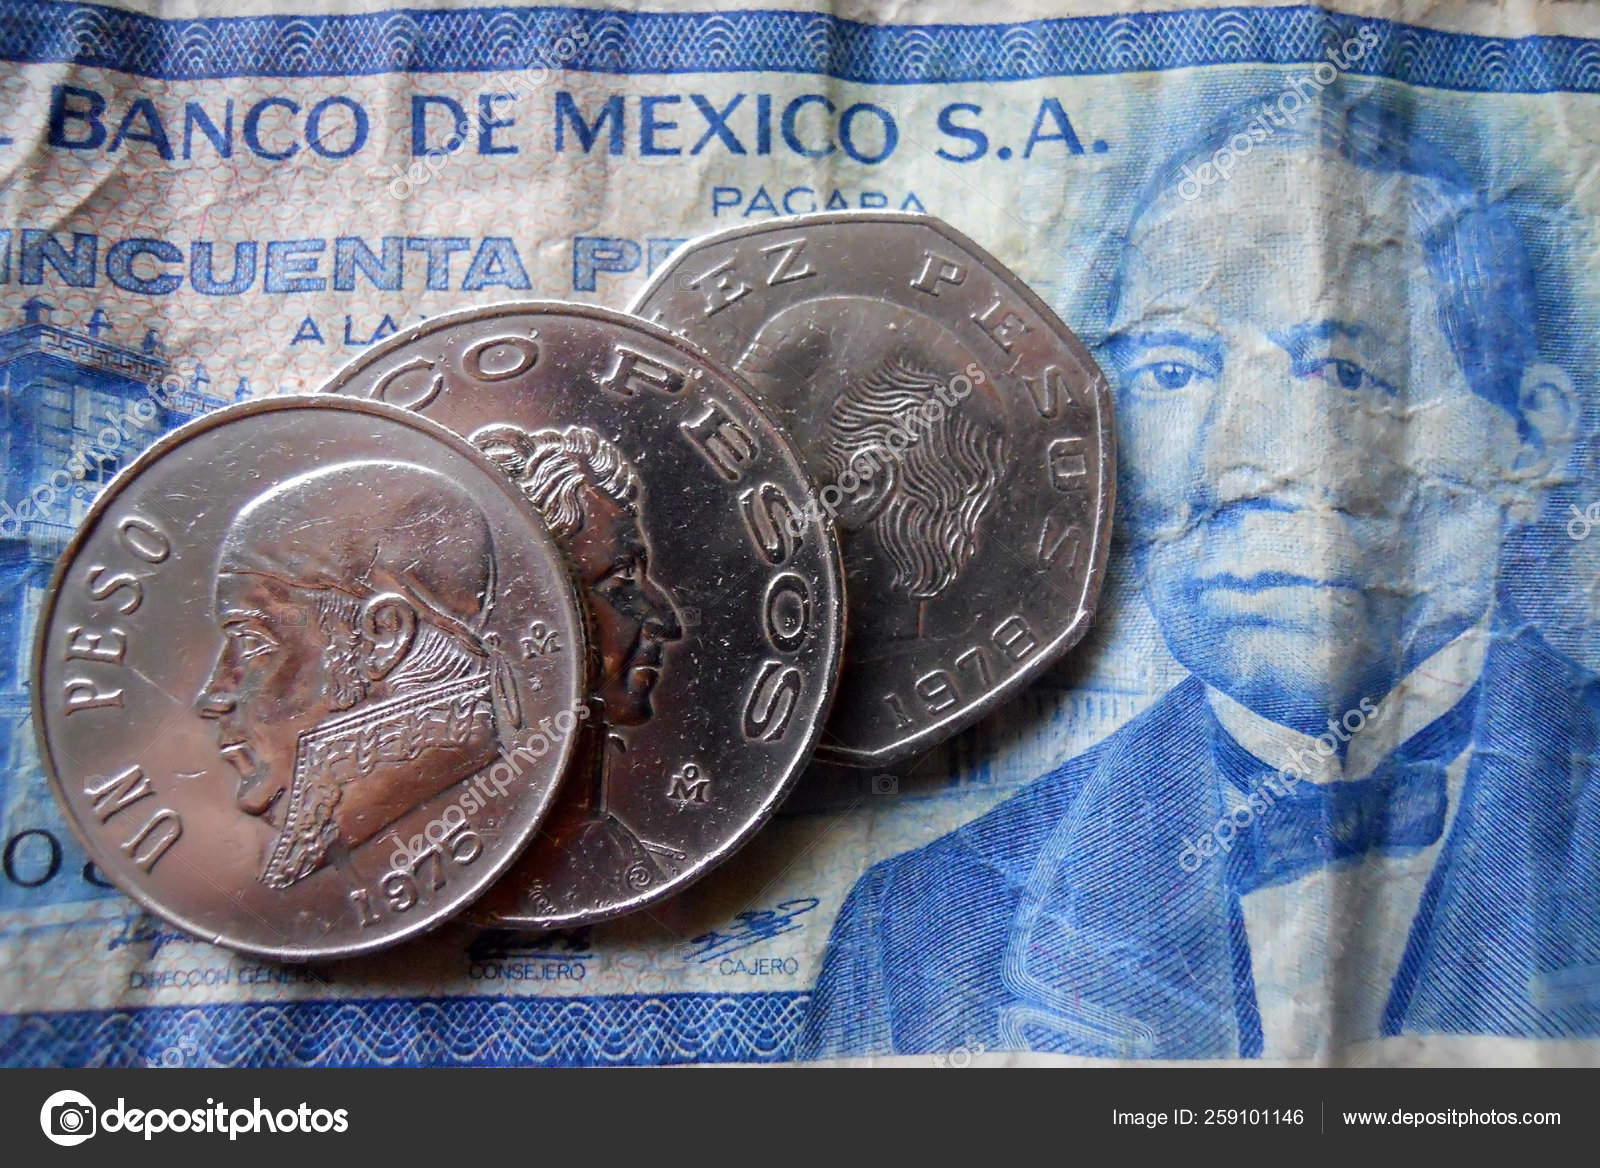 Mexican Money Peso Coins Centavo Bill Excellent Condition